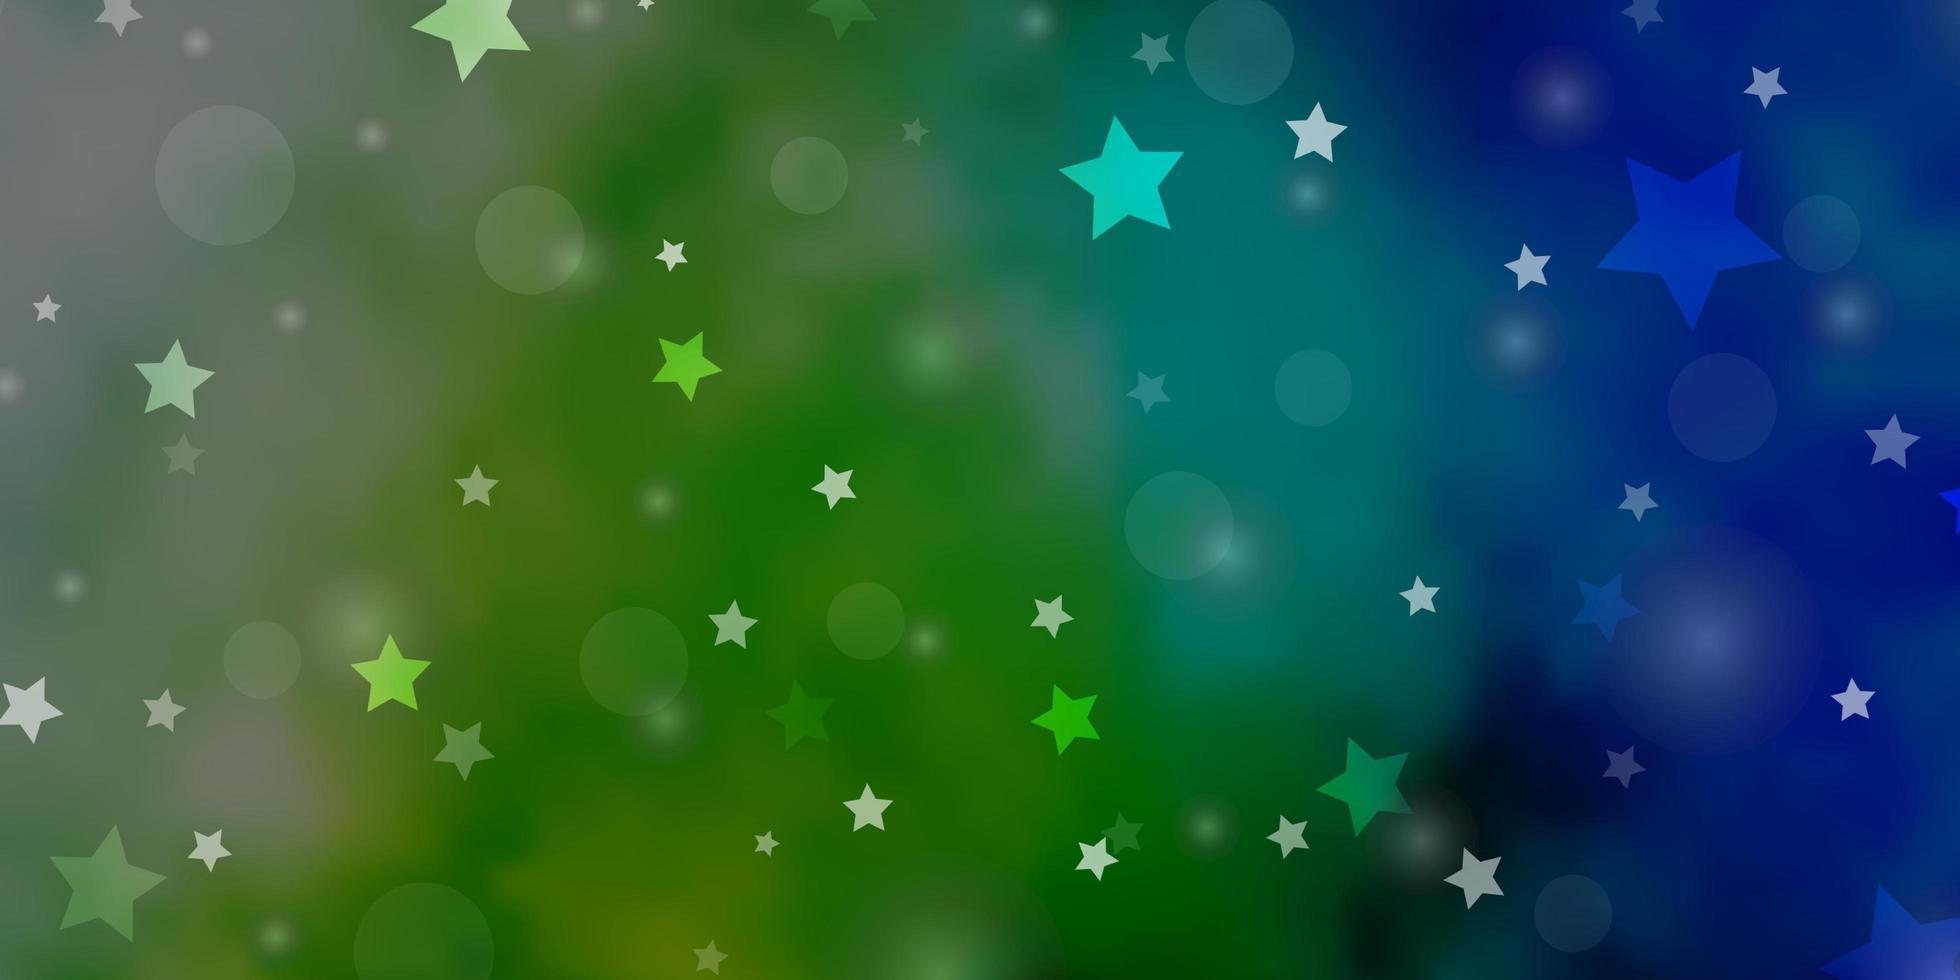 layout de vetor de azul claro e verde com círculos, estrelas.